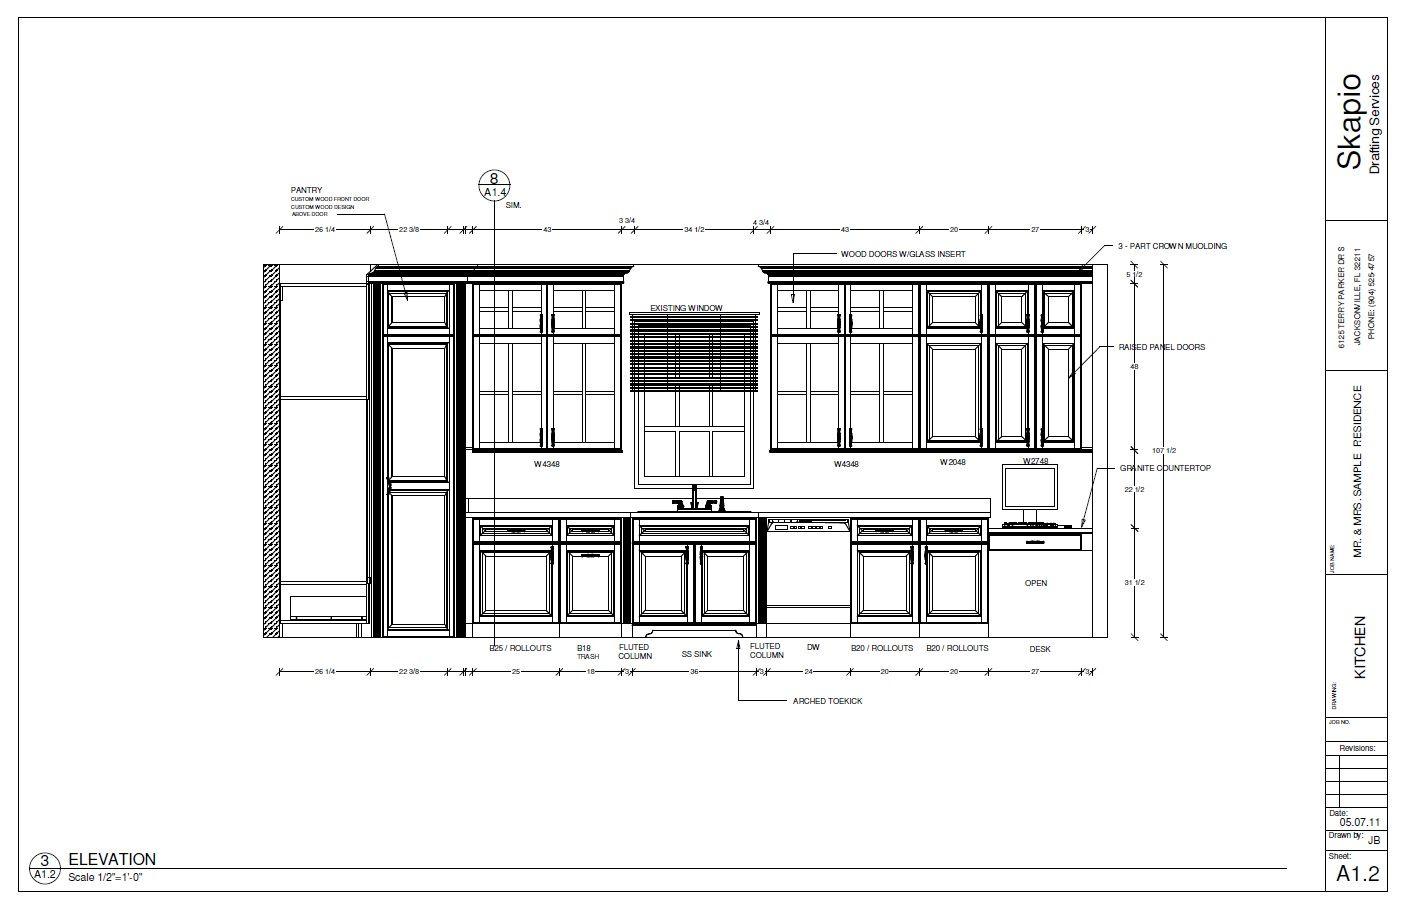 Sample Kitchen Elevation | Shop Drawings | Pinterest ...